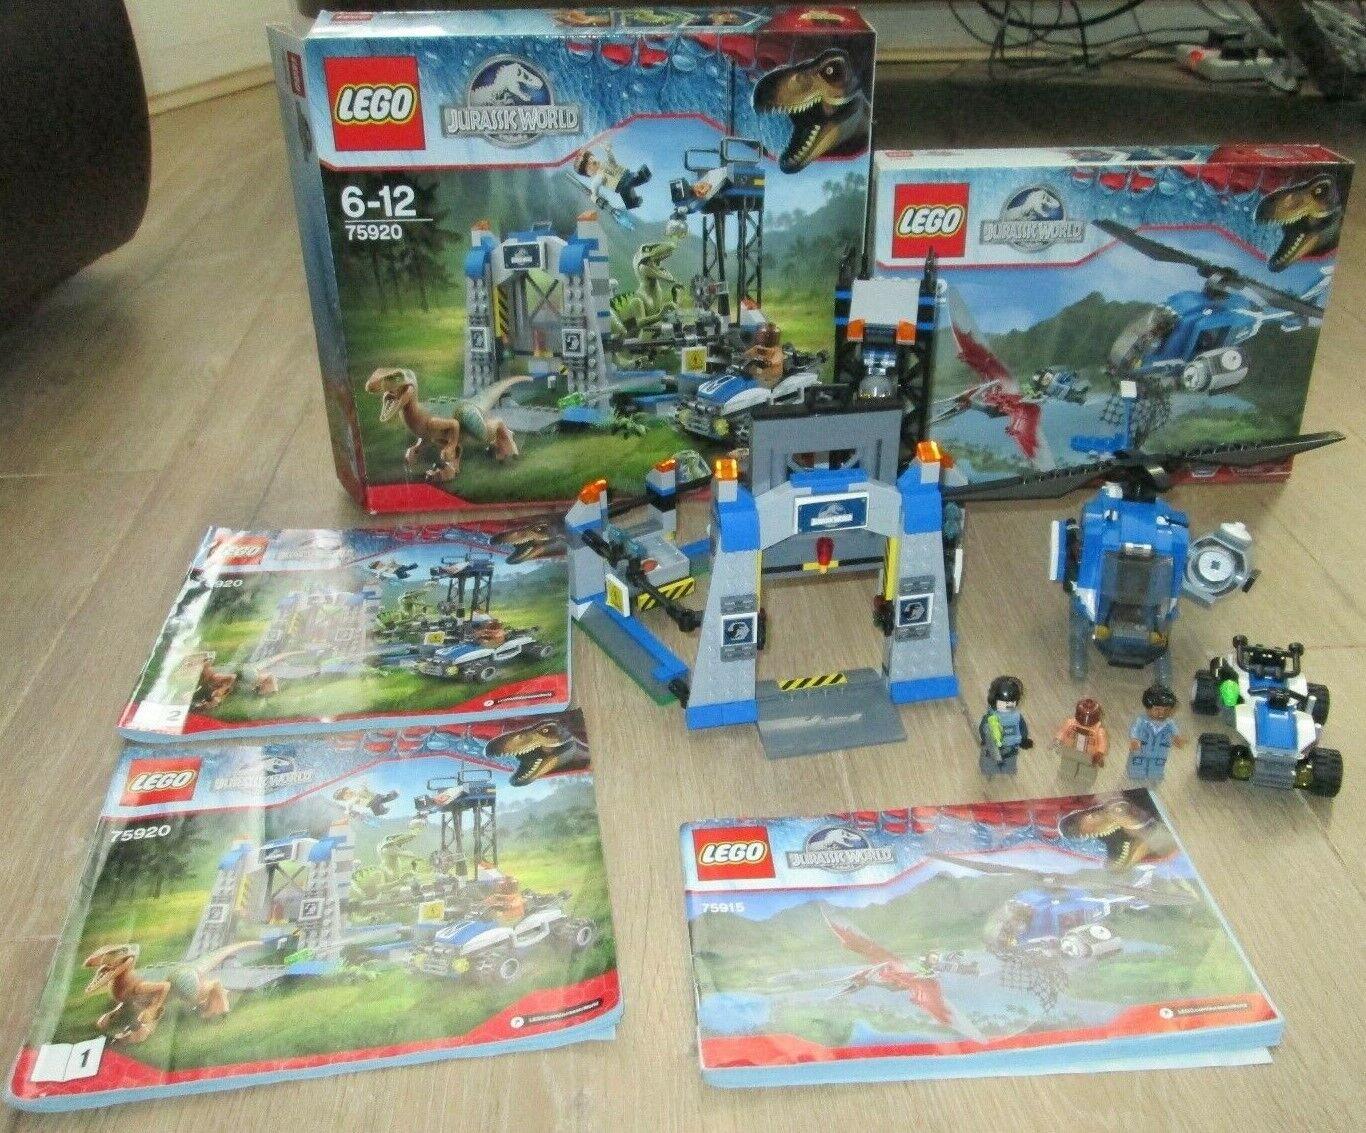 LEGO JURASSIC WORLD SET 75920 75915